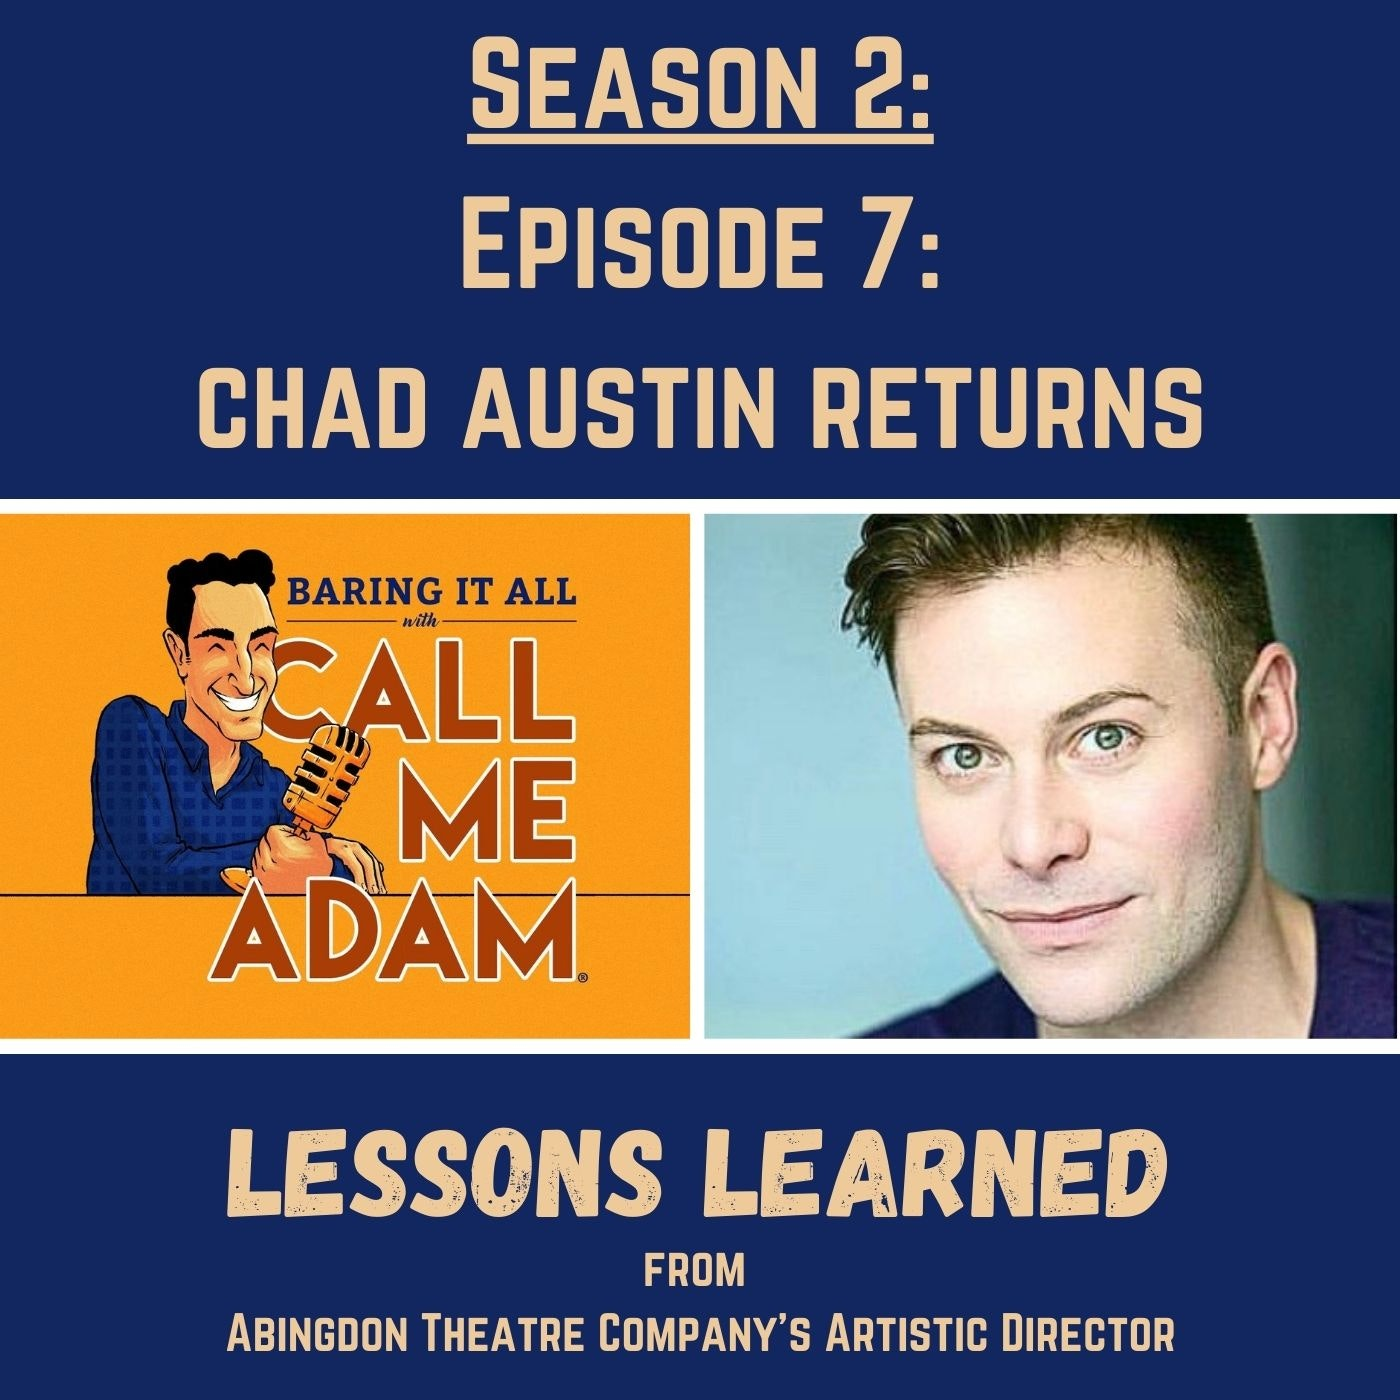 Season 2: Episode 7: Chad Austin Returns: Lessons Learned, Abingdon Theatre Artistic Director, Off-Broadway